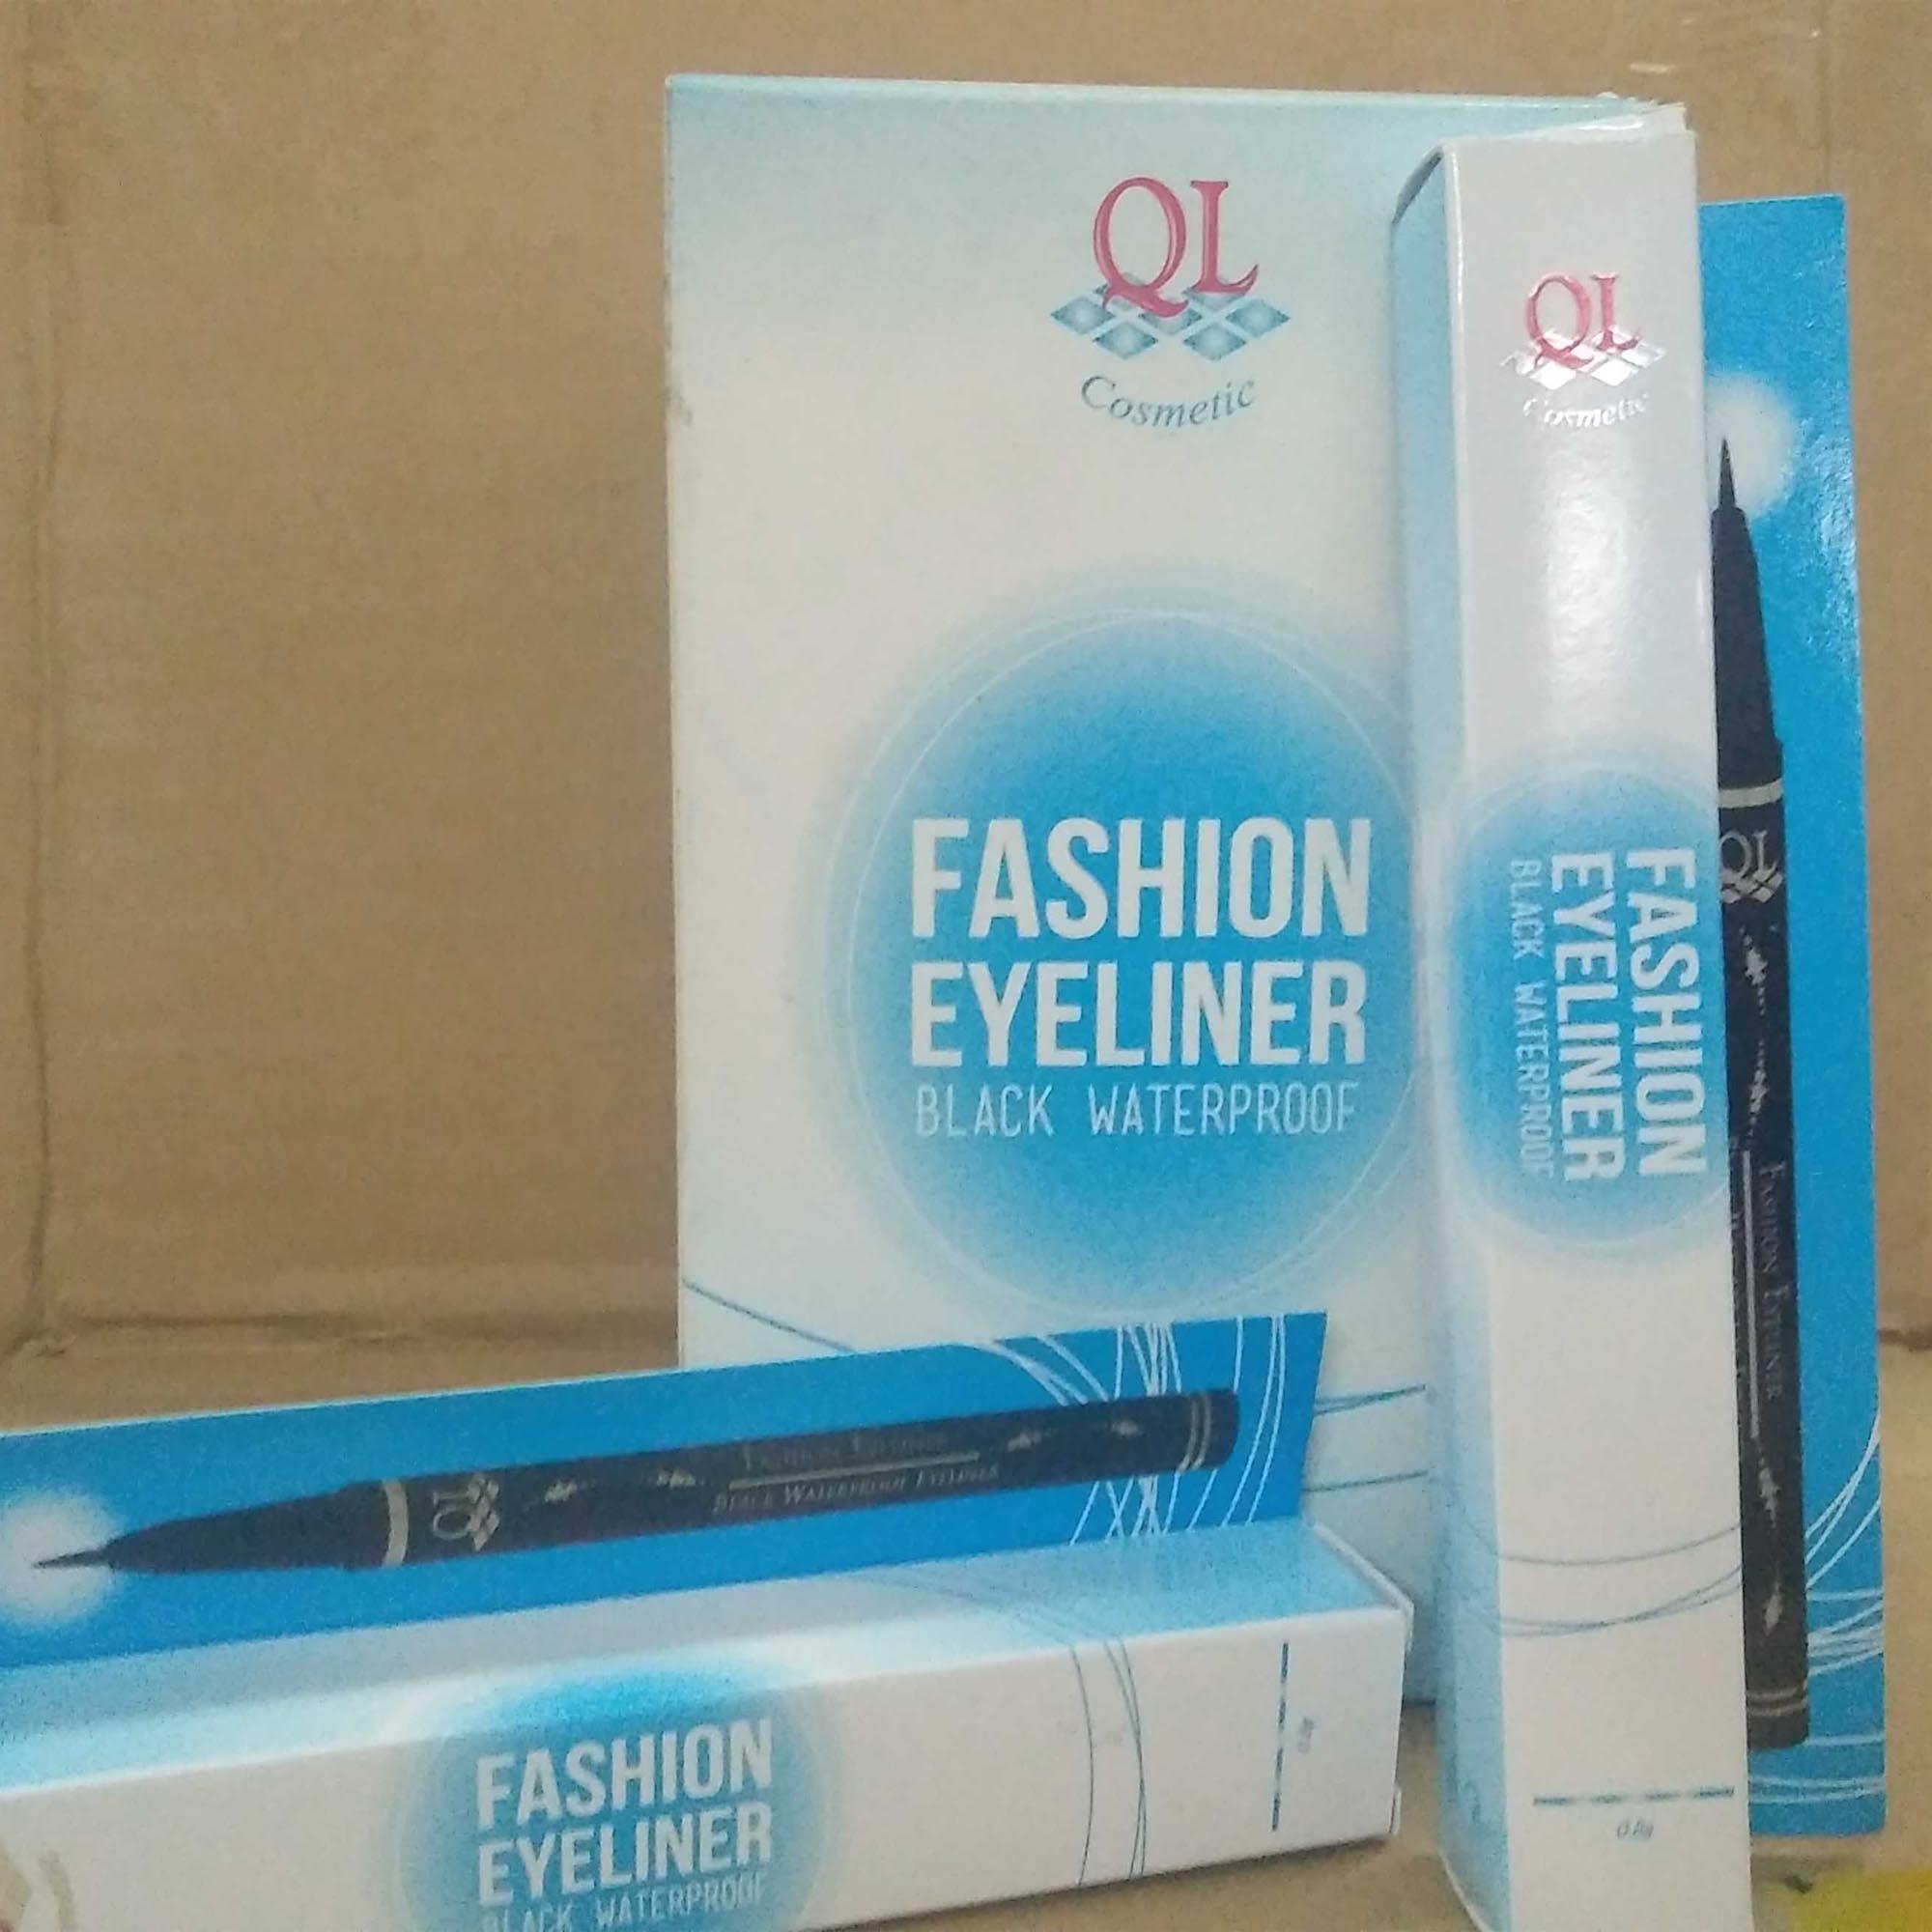 eyeliner spidol QL asli bpom berkualitas tahan air